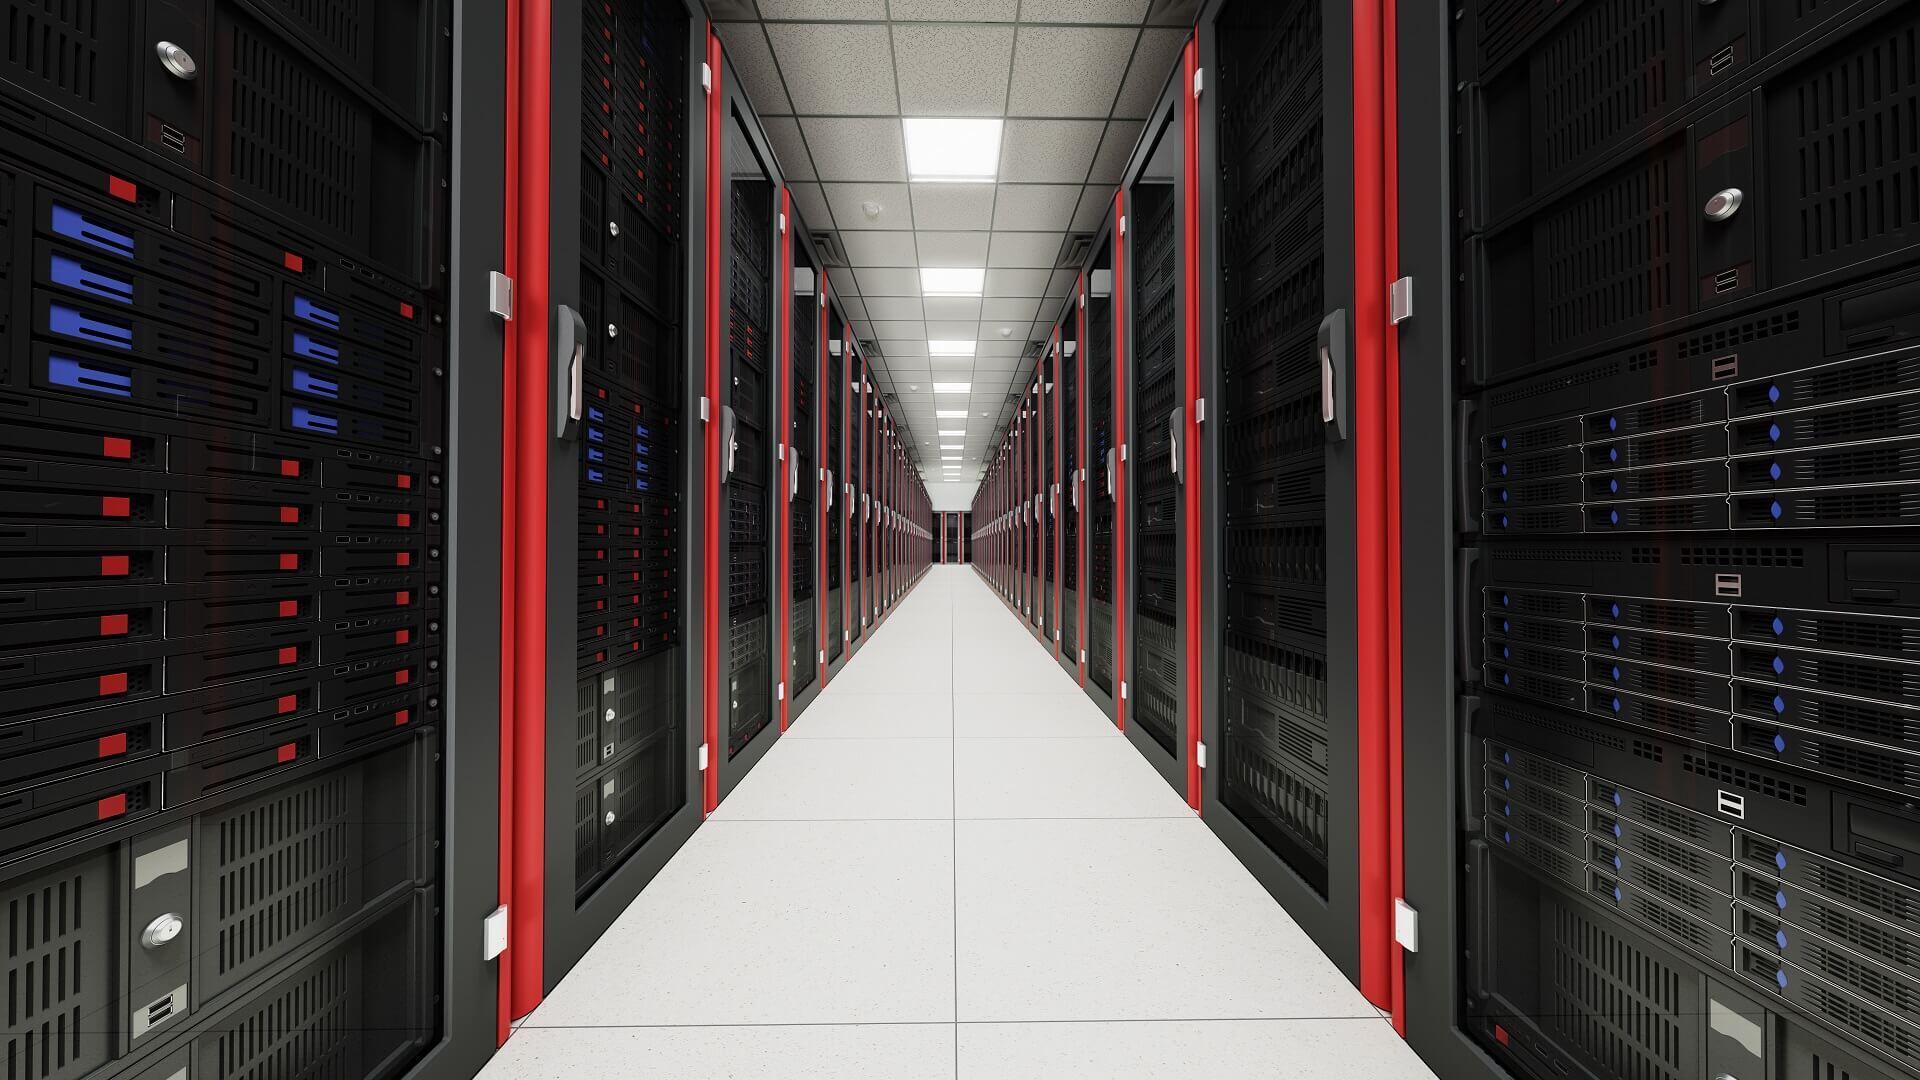 Serverraum in Rot.